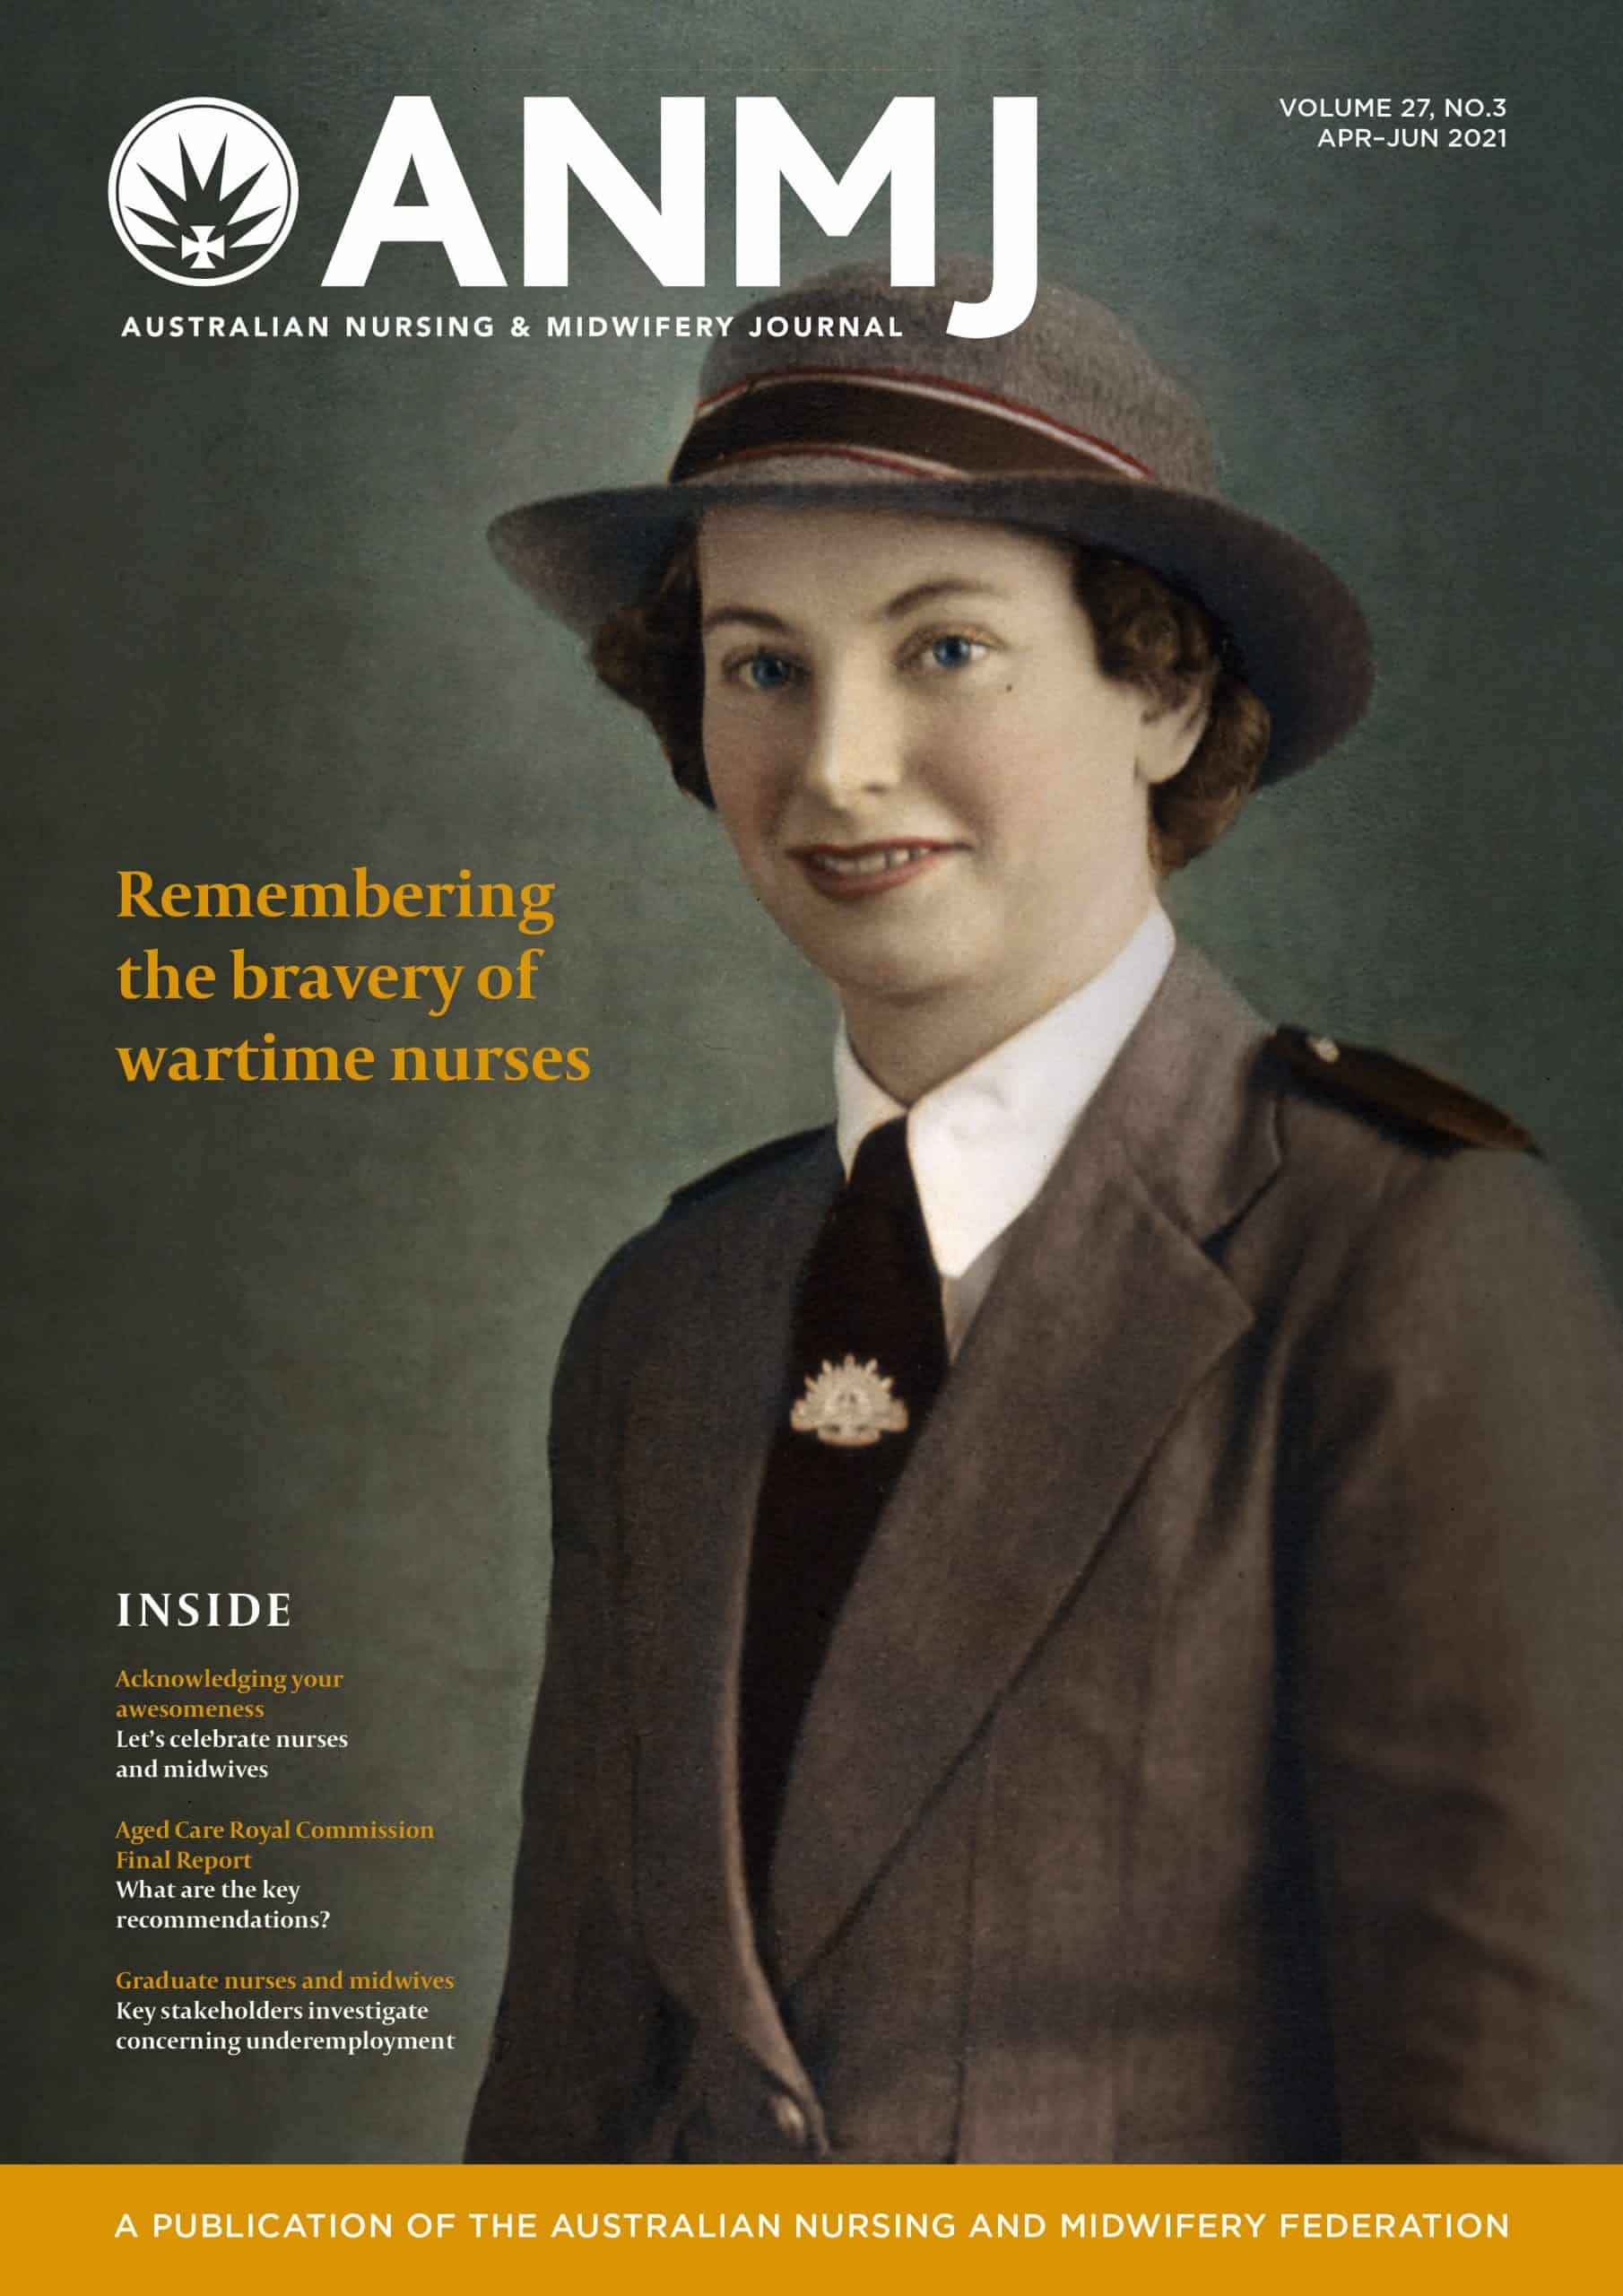 ANMJ Apr-Jun 2021 Issue